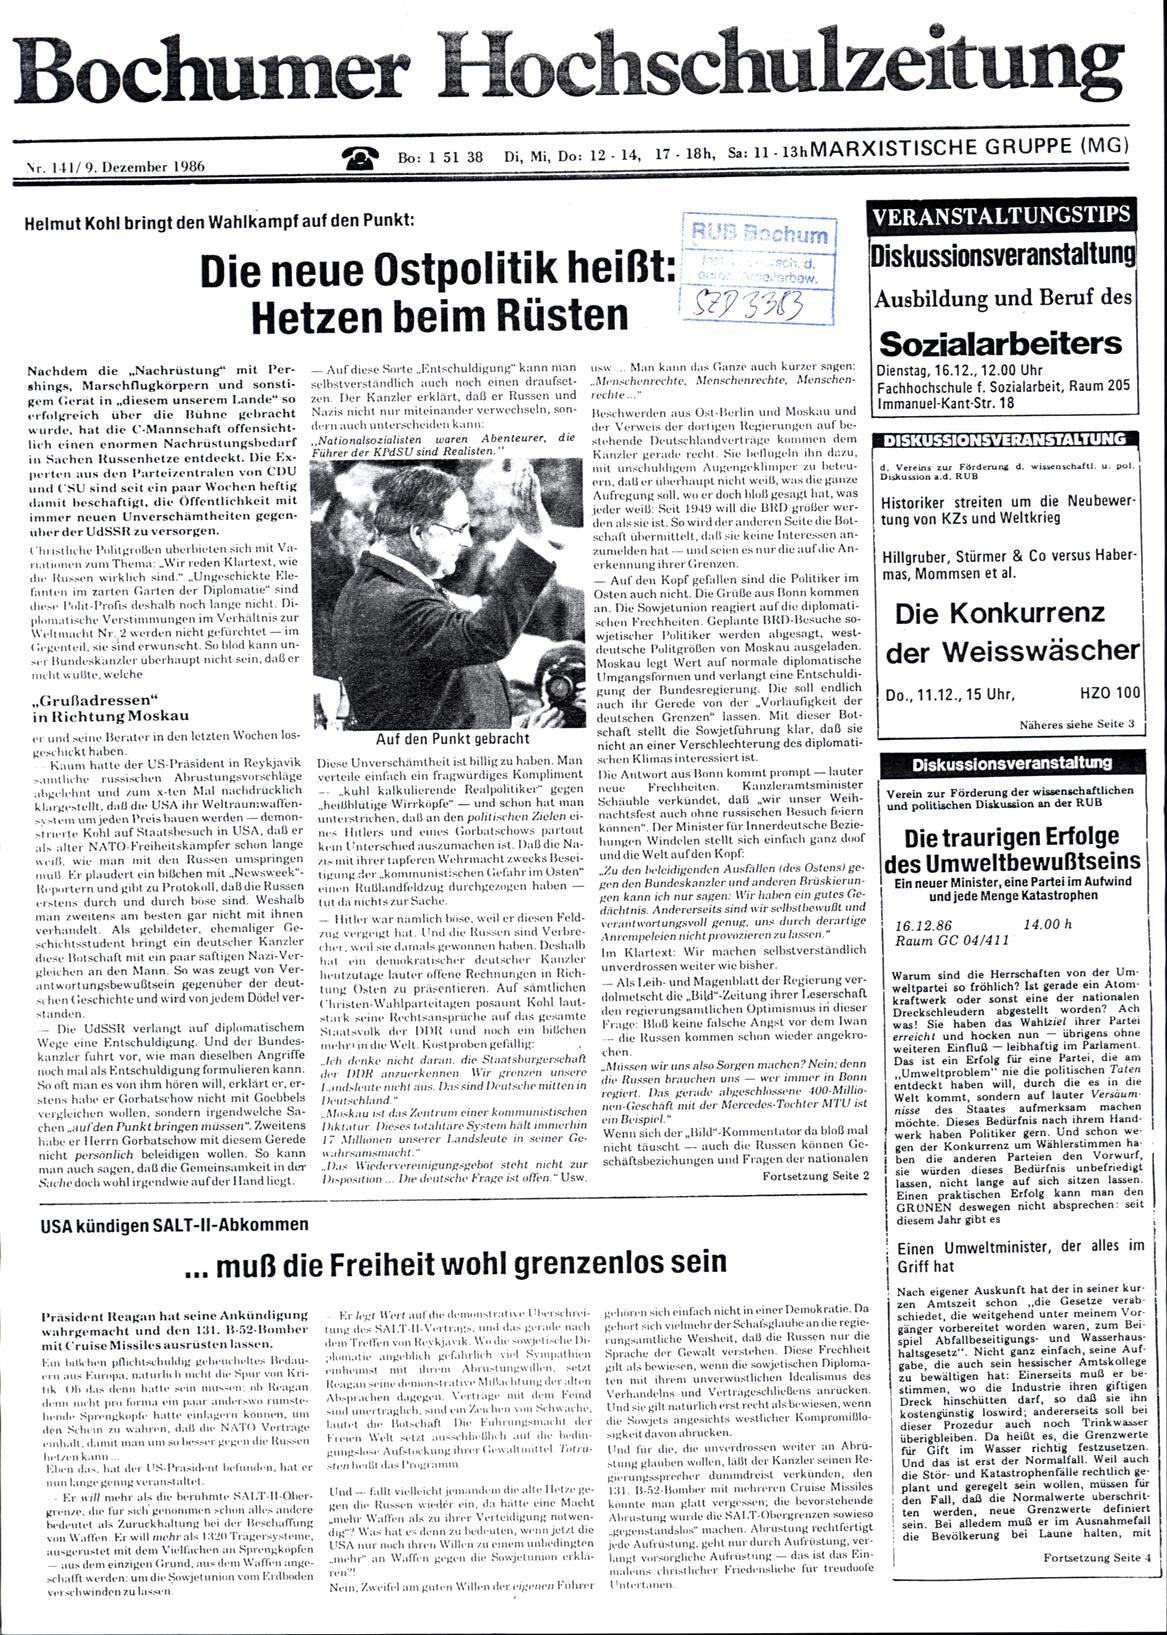 Bochum_BHZ_19861209_141_001